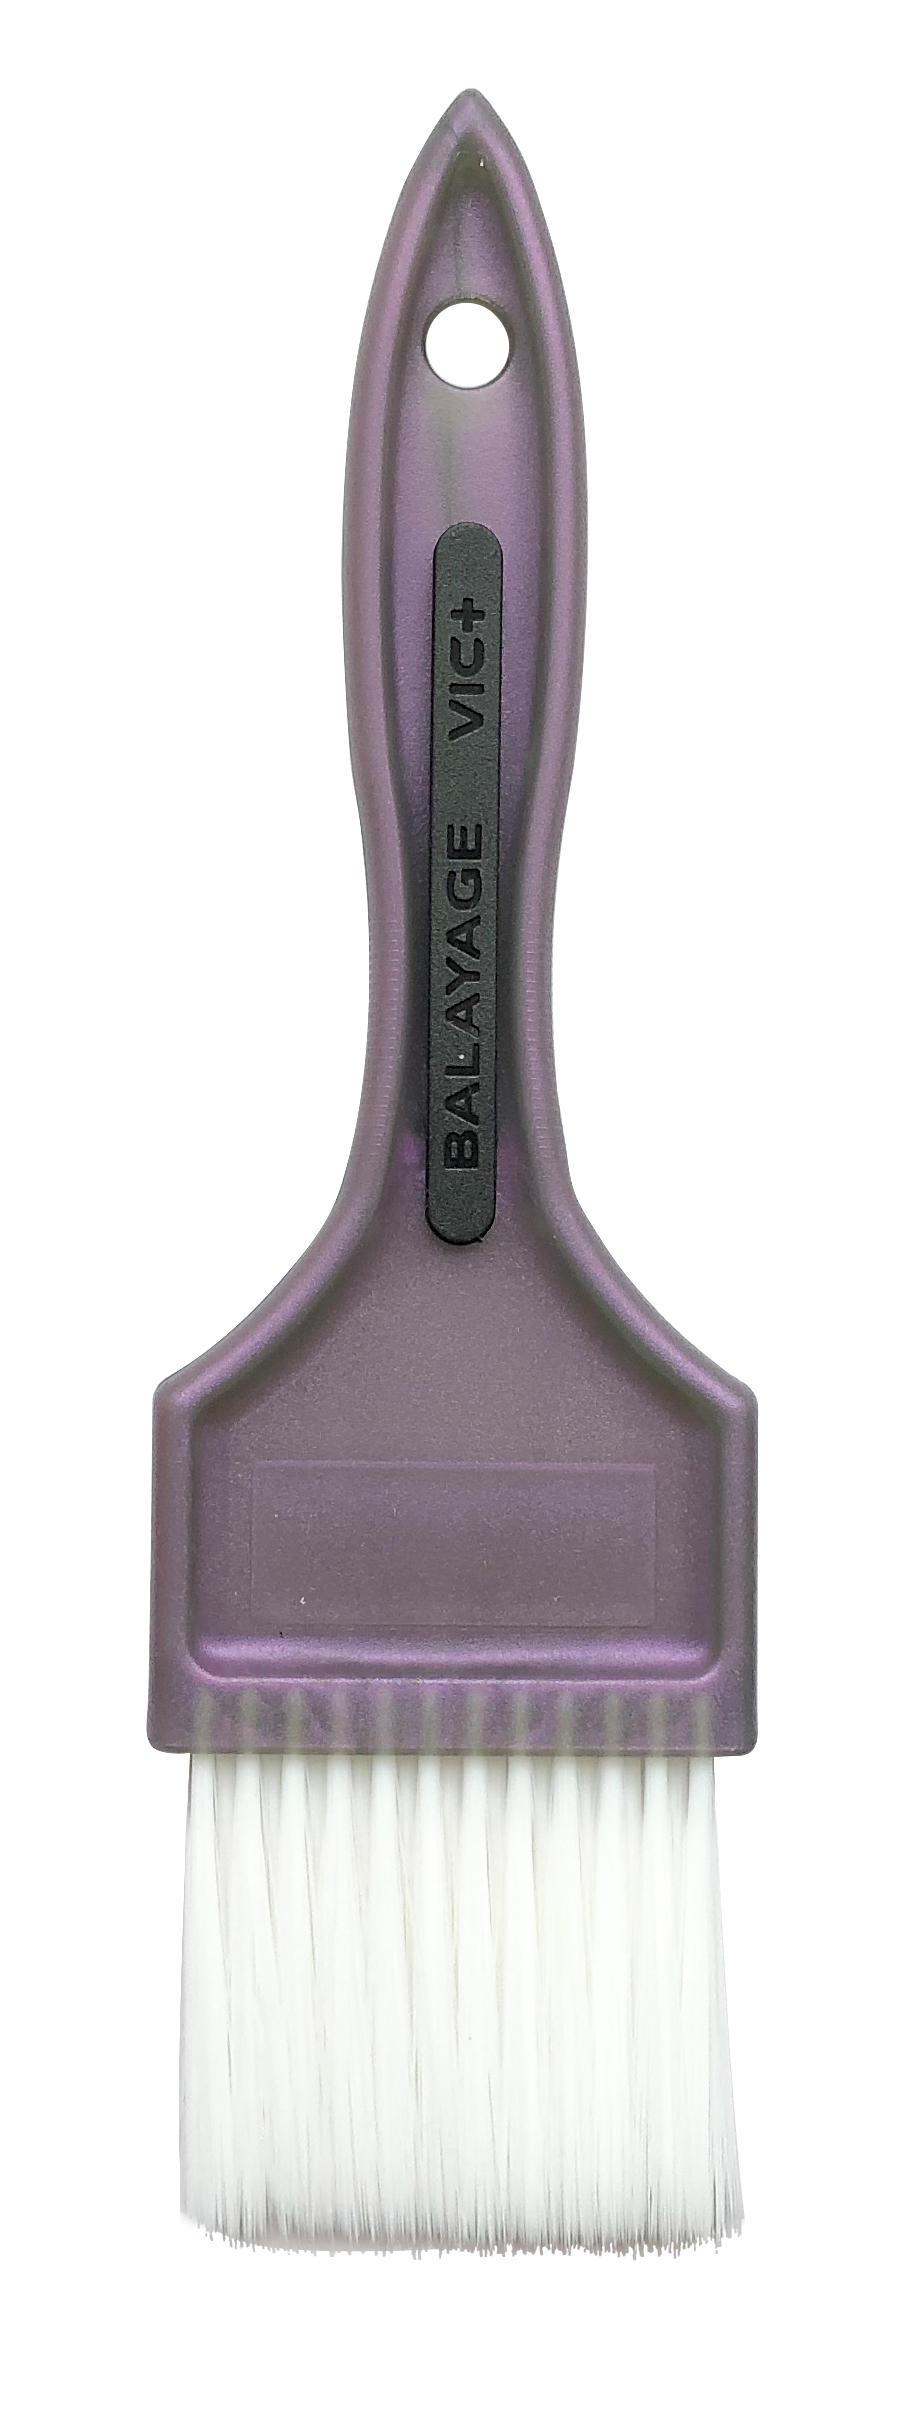 professional plastic tint brush hair coloring brush salon tools manufacturer